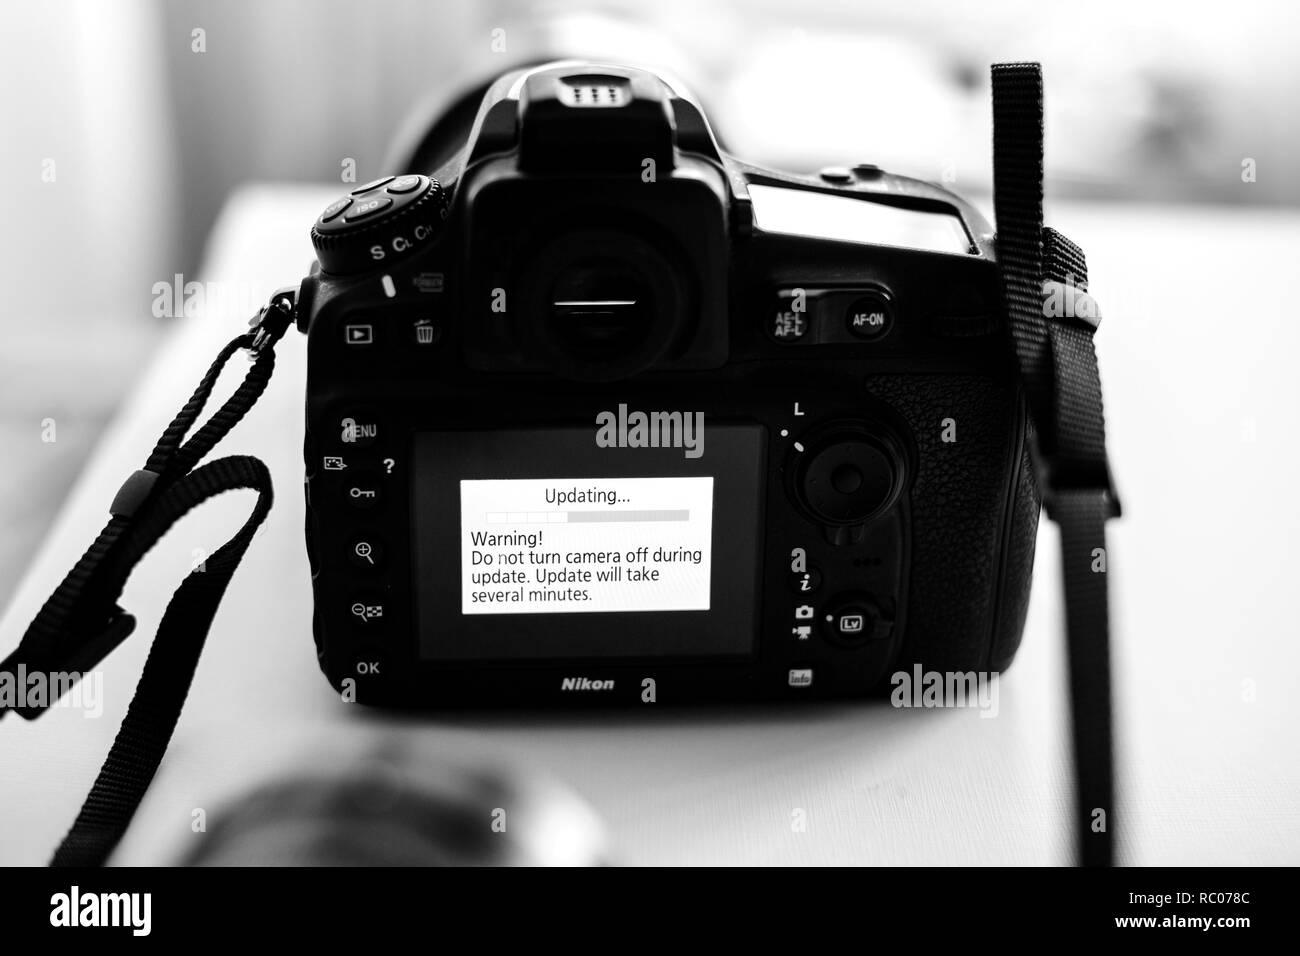 Dslr Nikon Stock Photos & Dslr Nikon Stock Images - Alamy